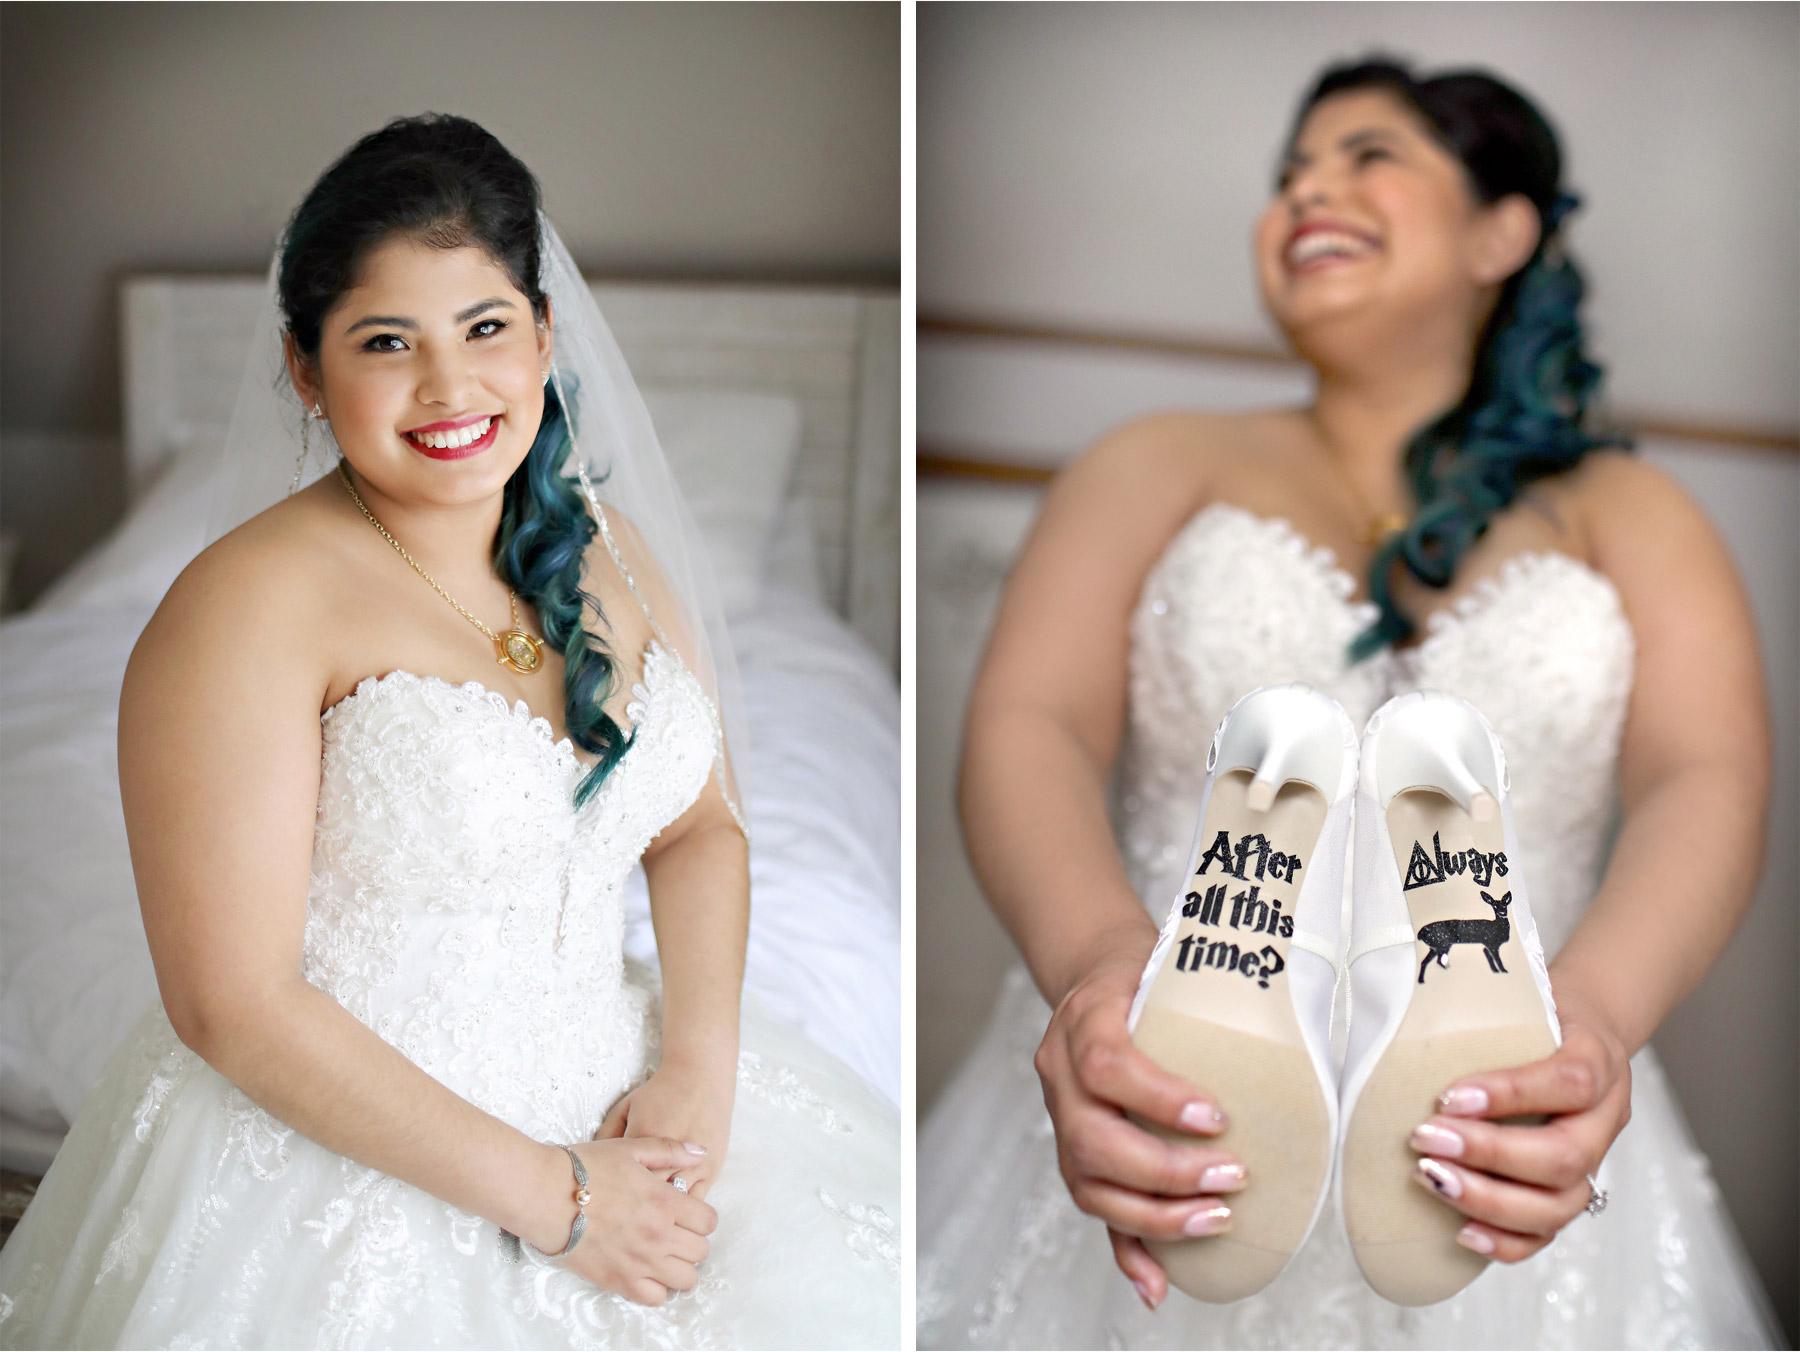 03-Saint-Paul-Minnesota-Wedding-Photography-by-Vick-Photography-Dress-Harry-Potter-Themed-Wedding-Shoes-Elena-and-Doug.jpg